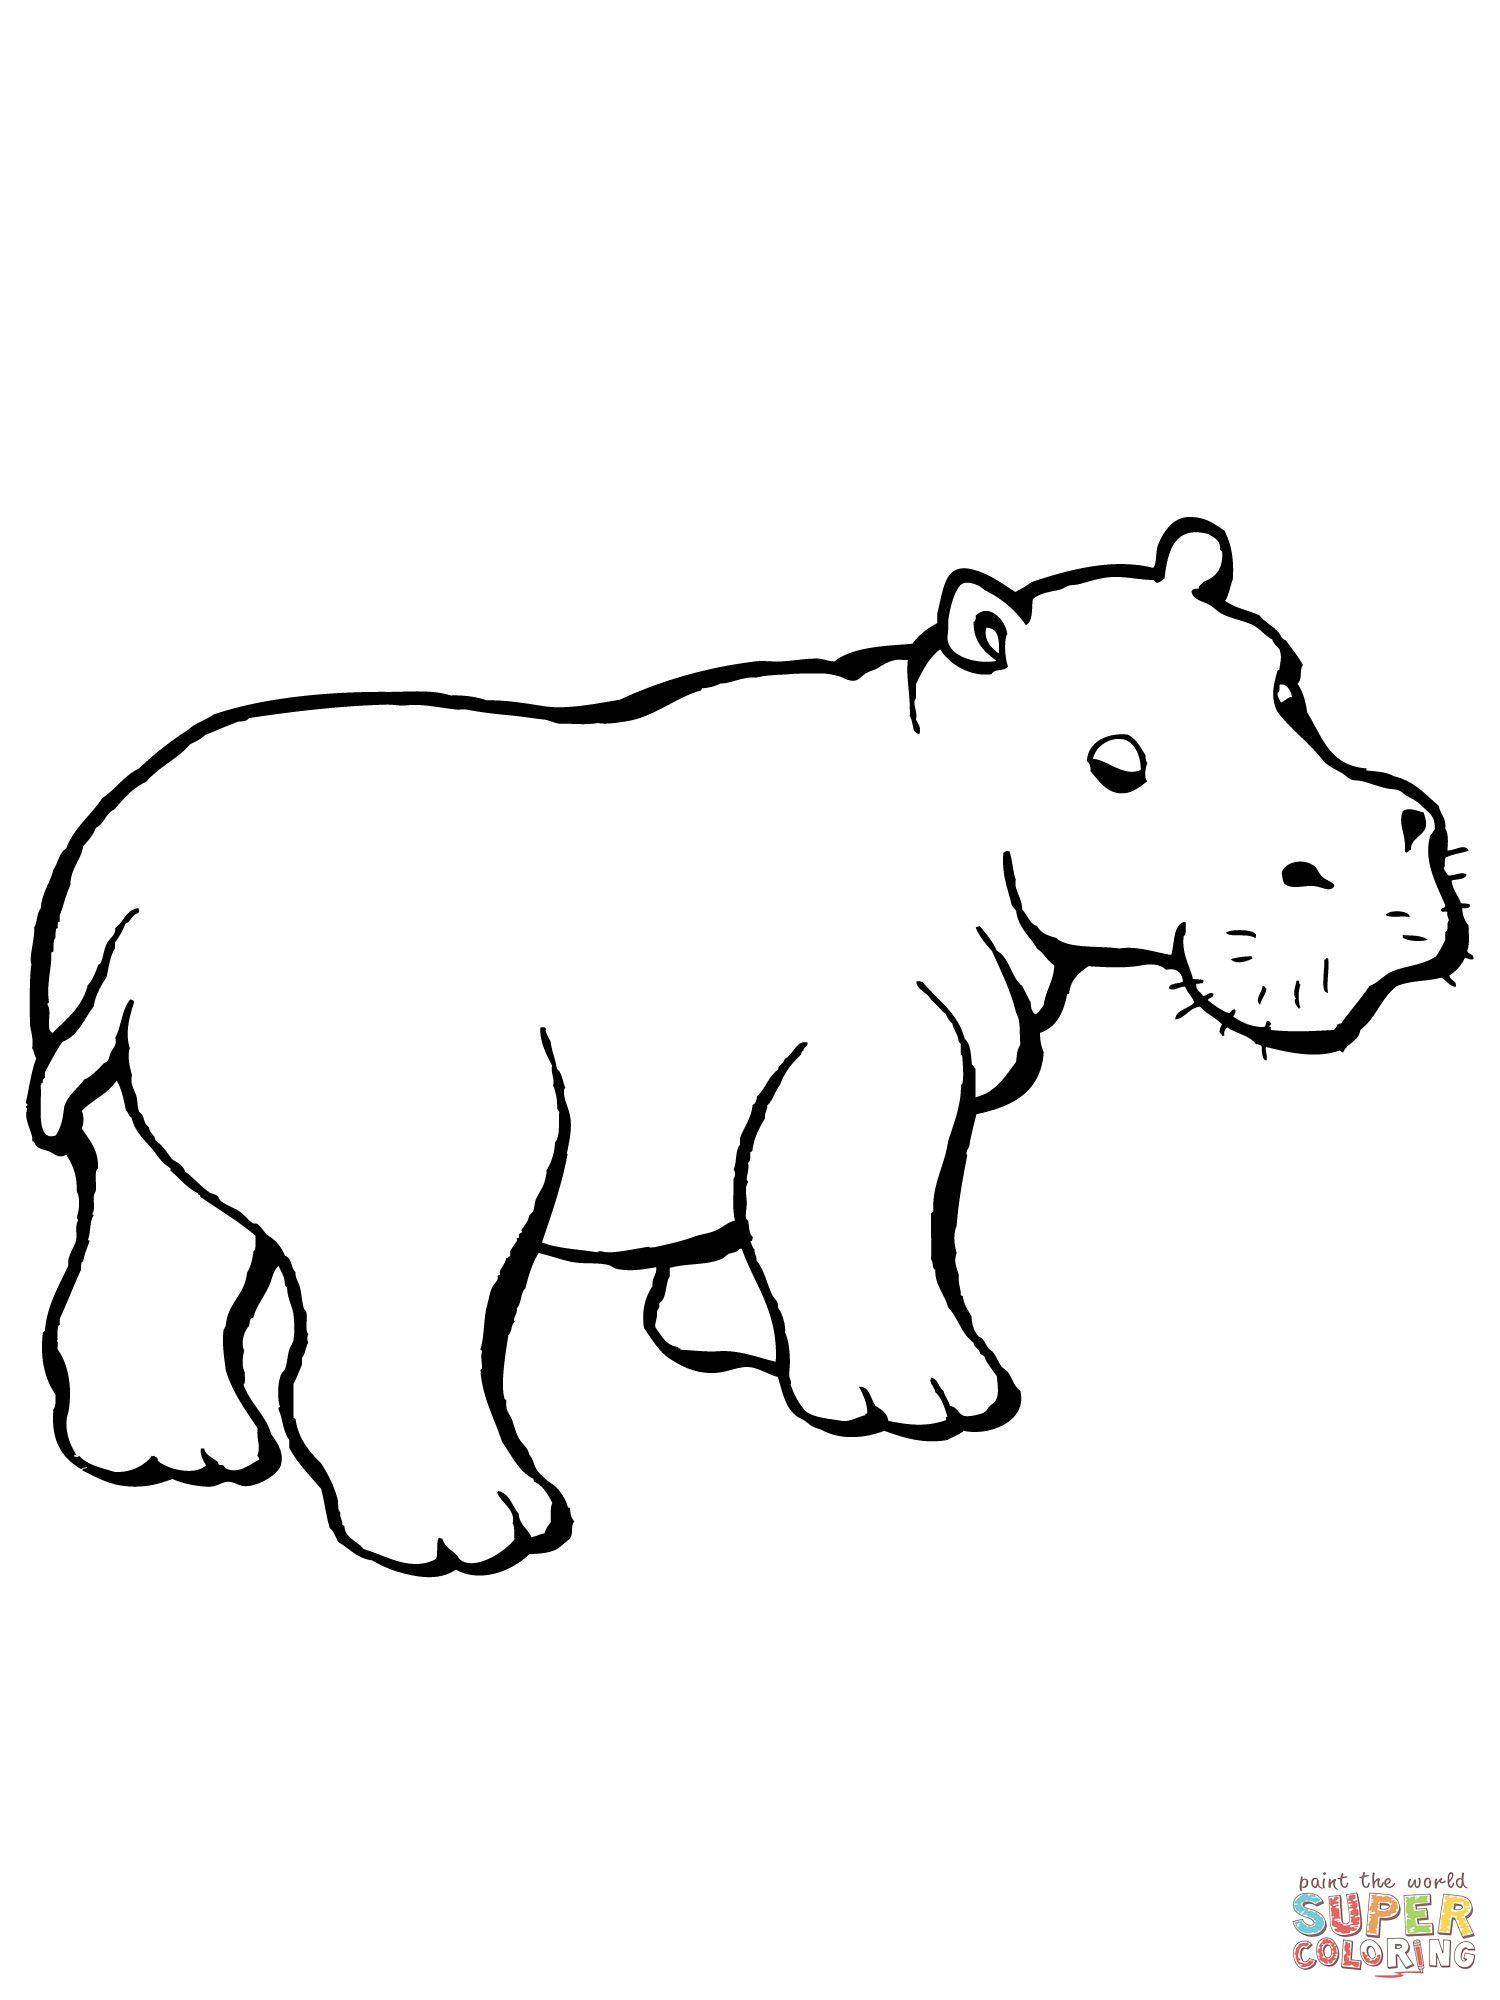 Hippo Clipart Black And White Google Search Hippo Drawing Cute Hippo Black And White Google